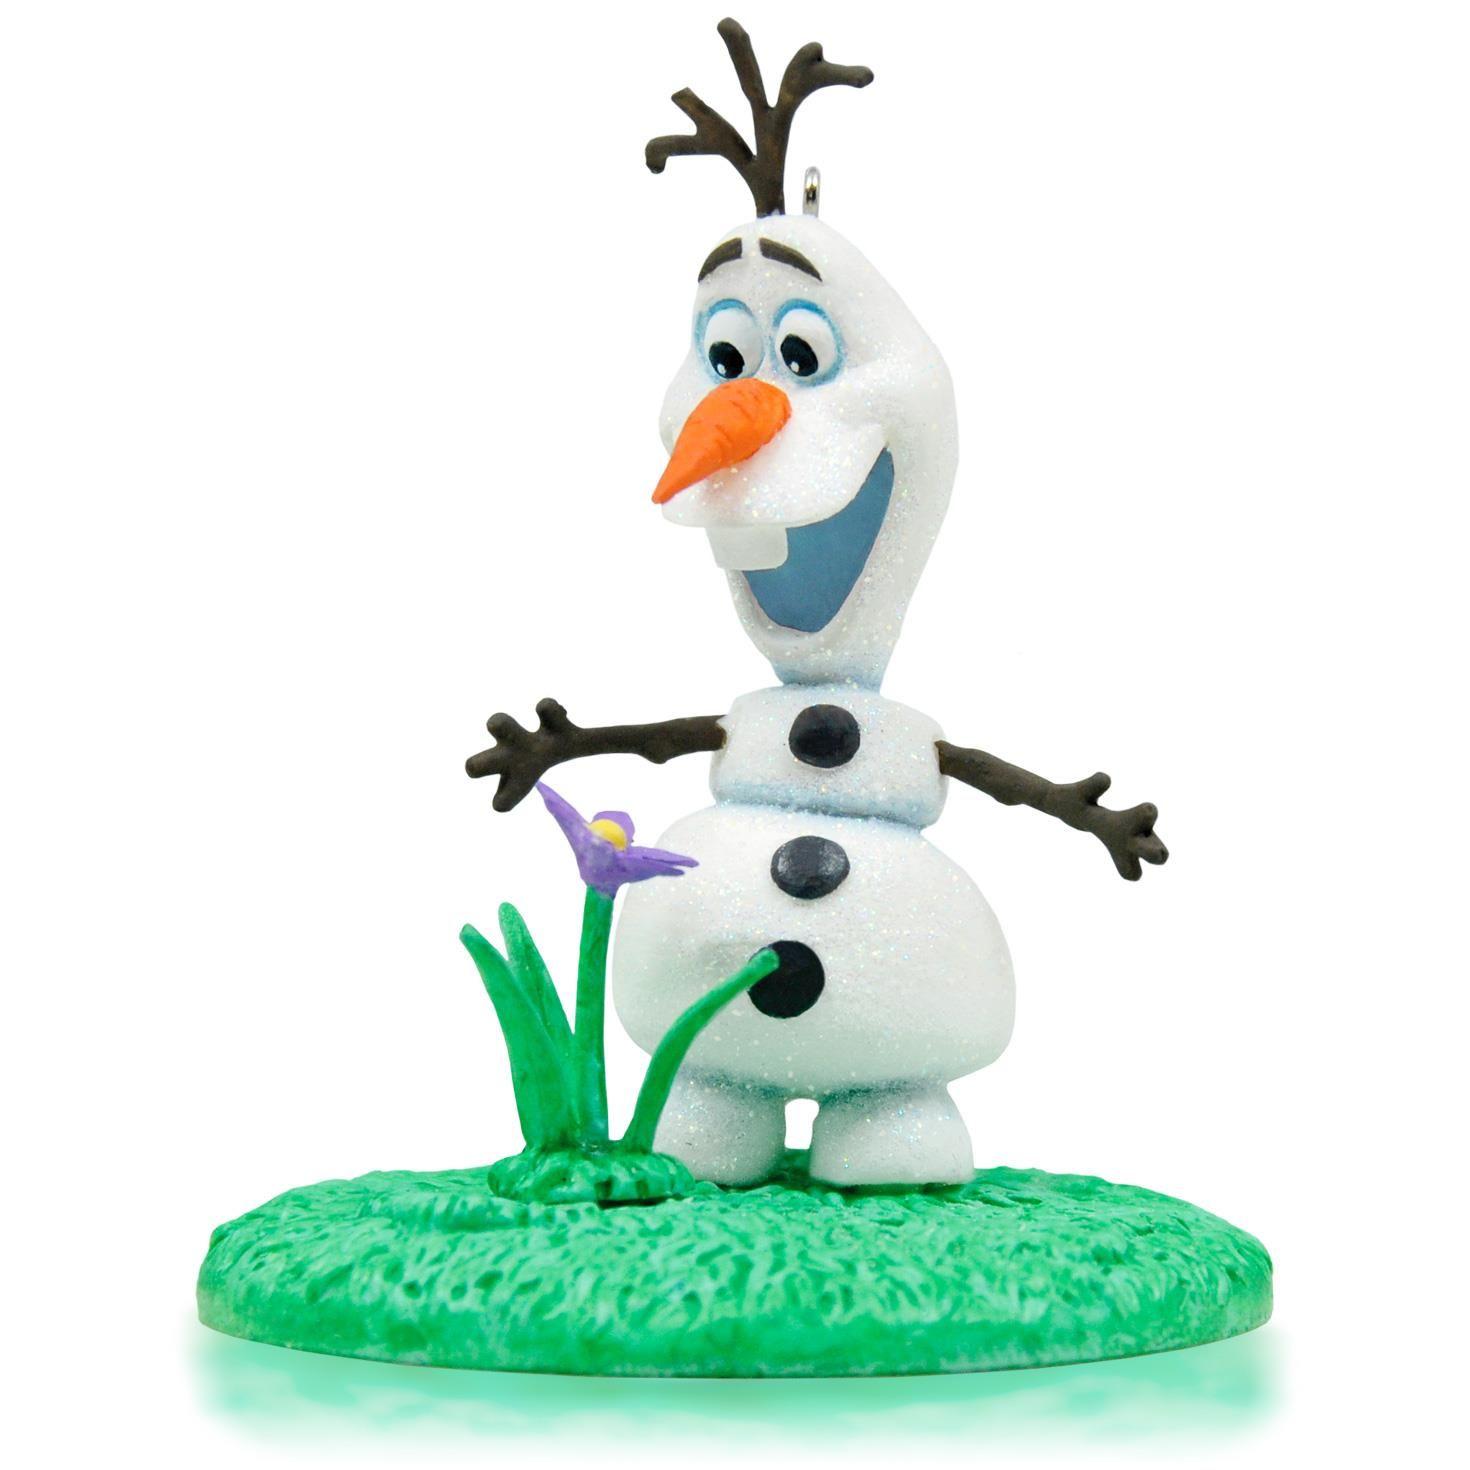 Disney Characters Christmas Ornaments